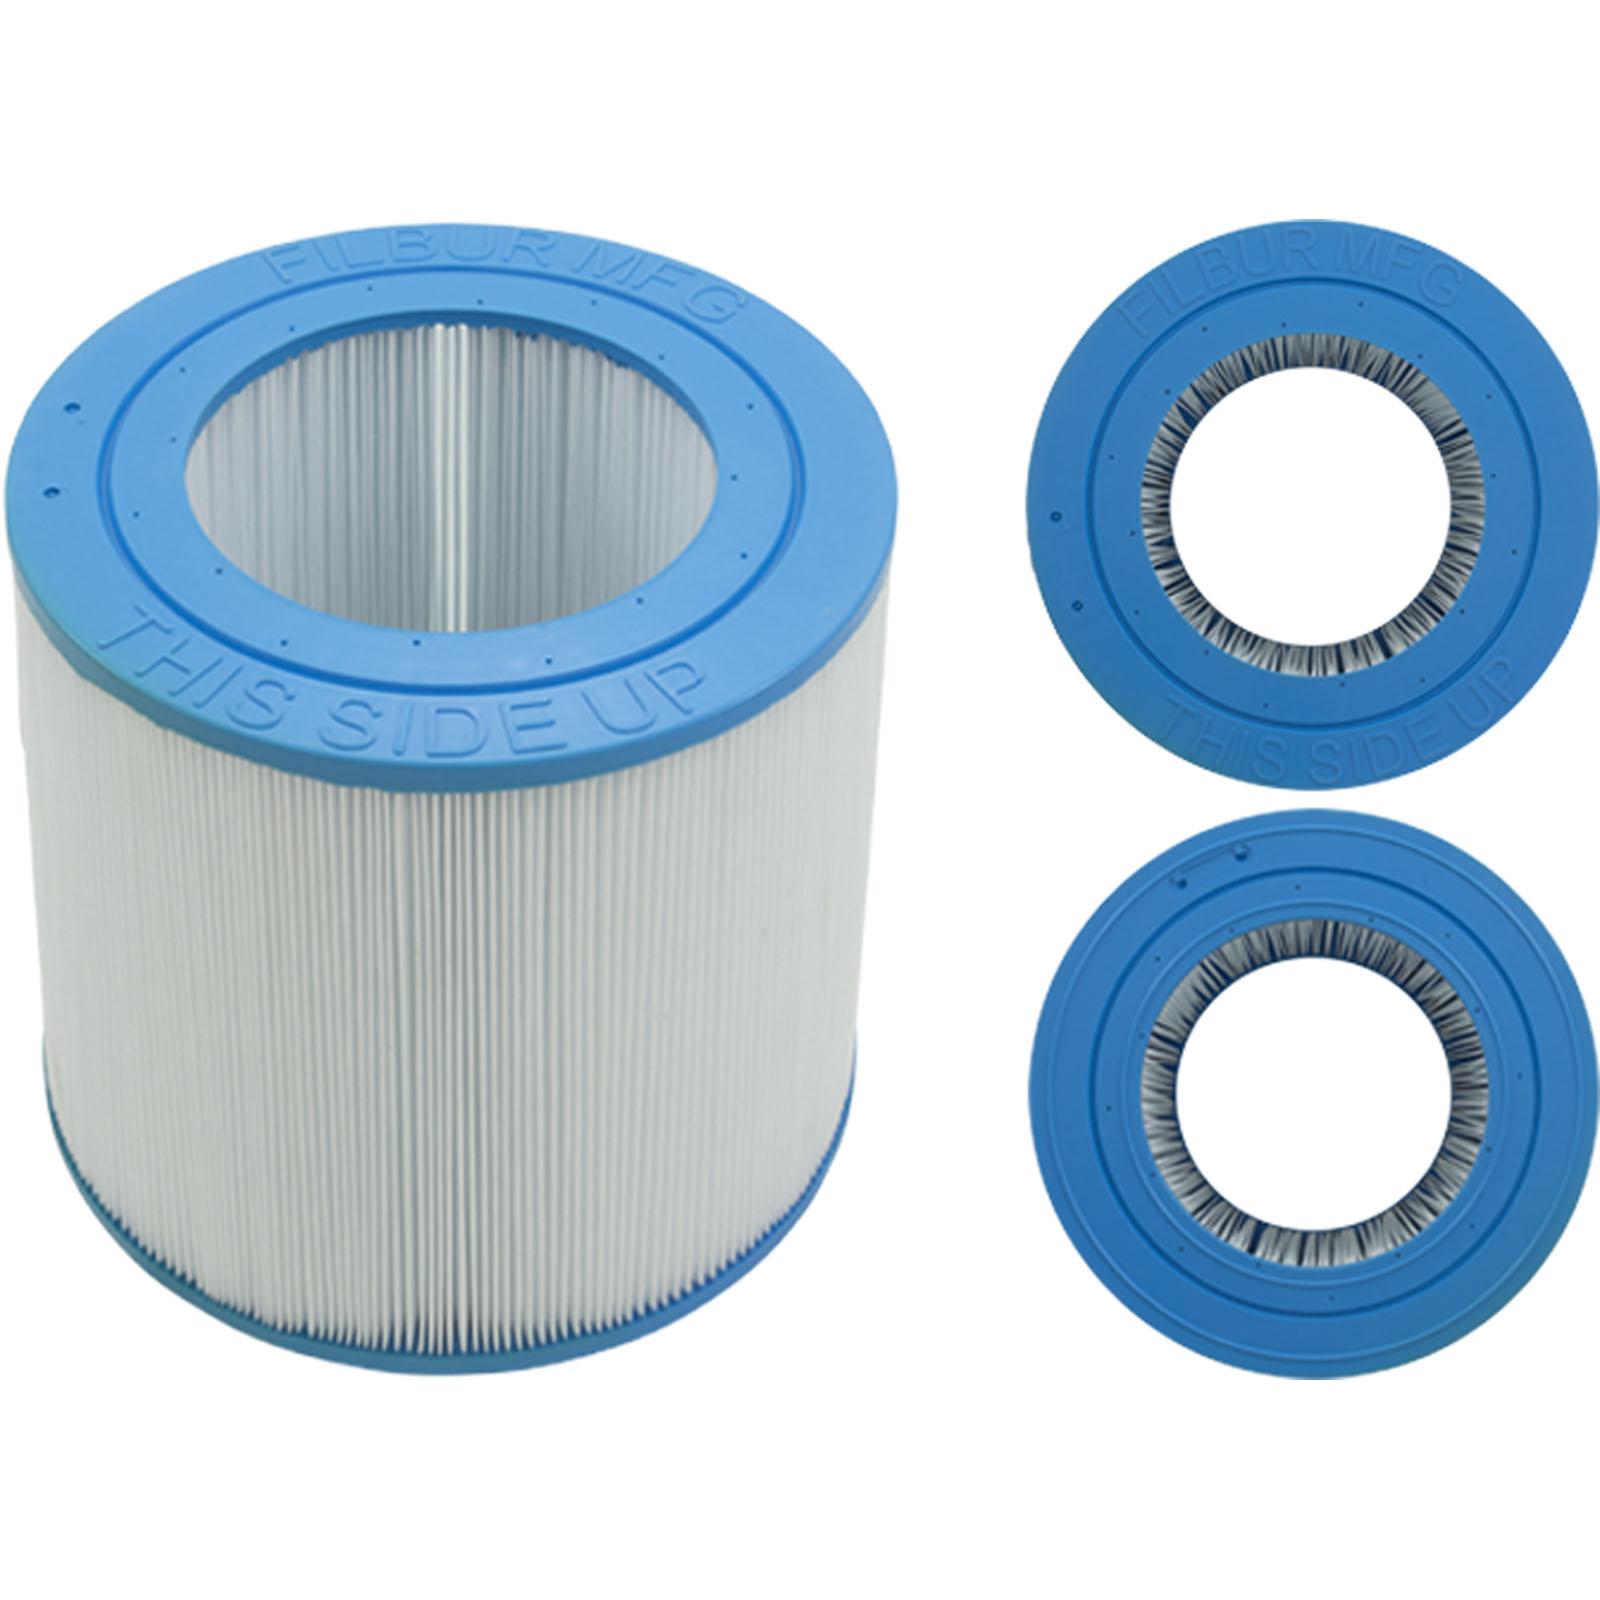 Predator 50sqft Replacement Filter Cartridge - PAP50, C-9405, FC-0684